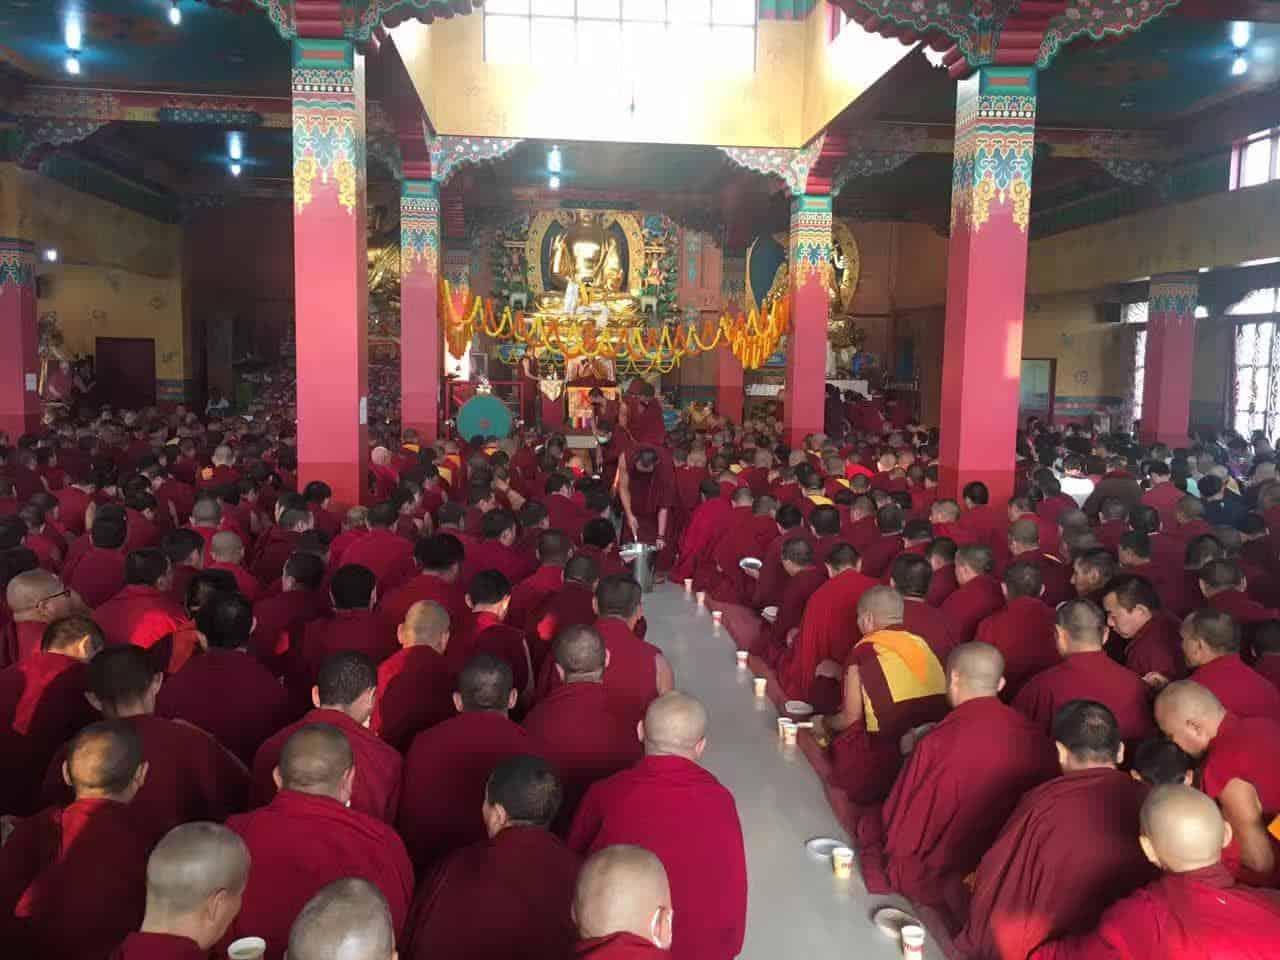 Gosok Rinpoche India 2017 longlife 15bc2a40a5d7baa052f47b05200b833